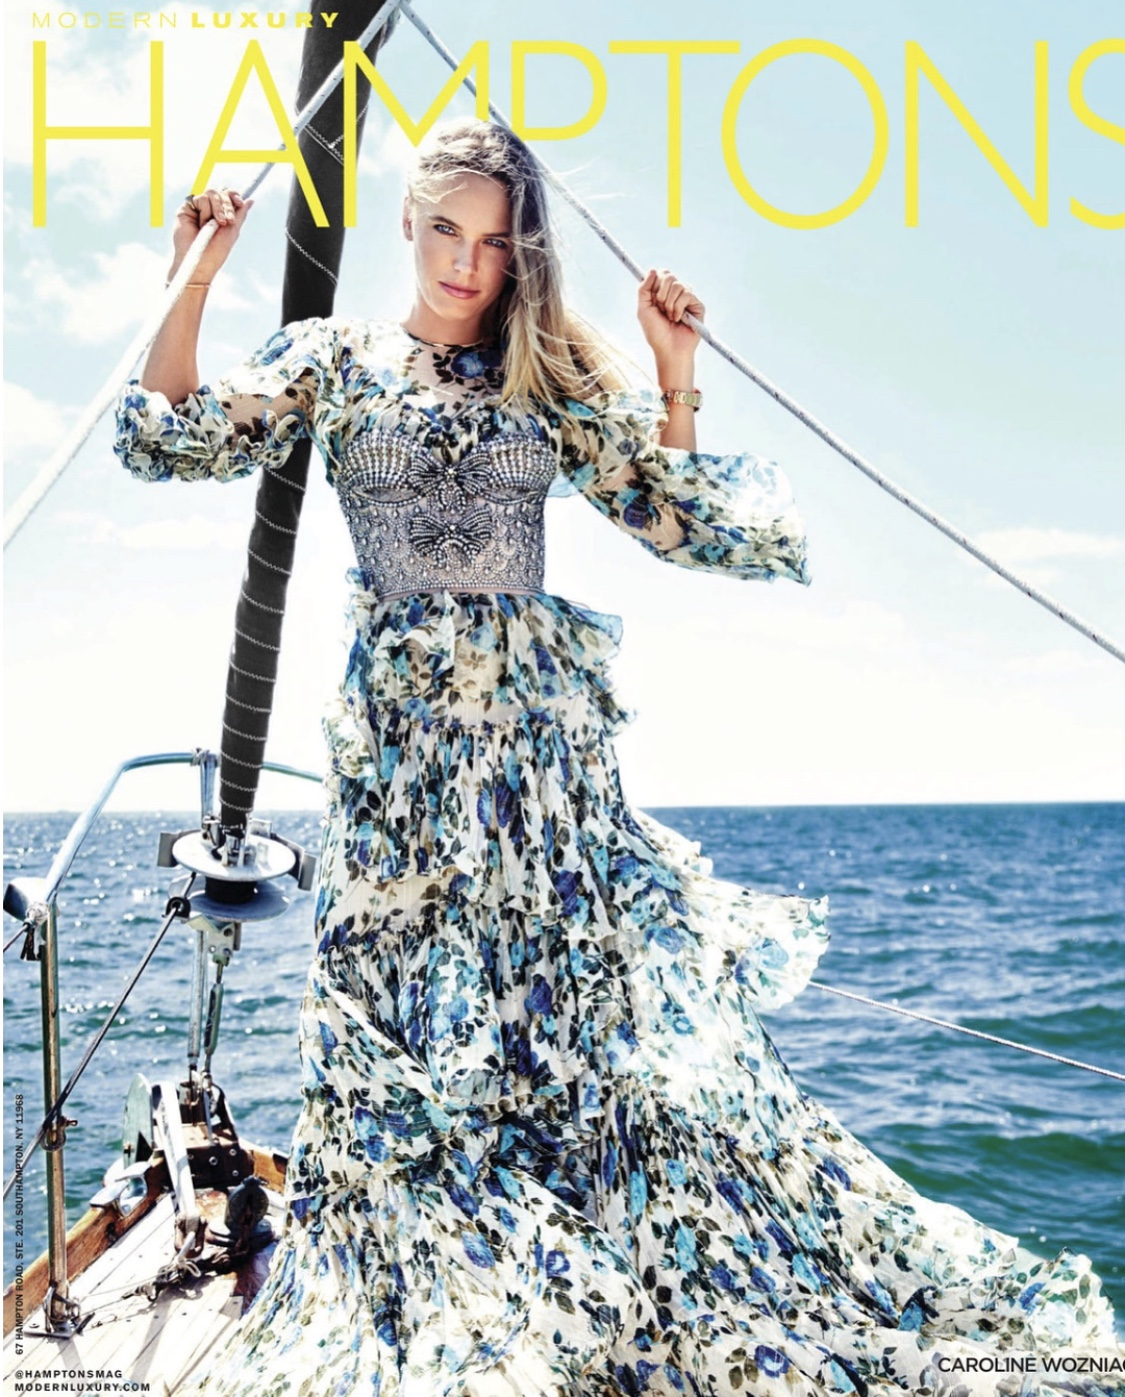 Modern Luxury Hamptons Summer 2018 Cover